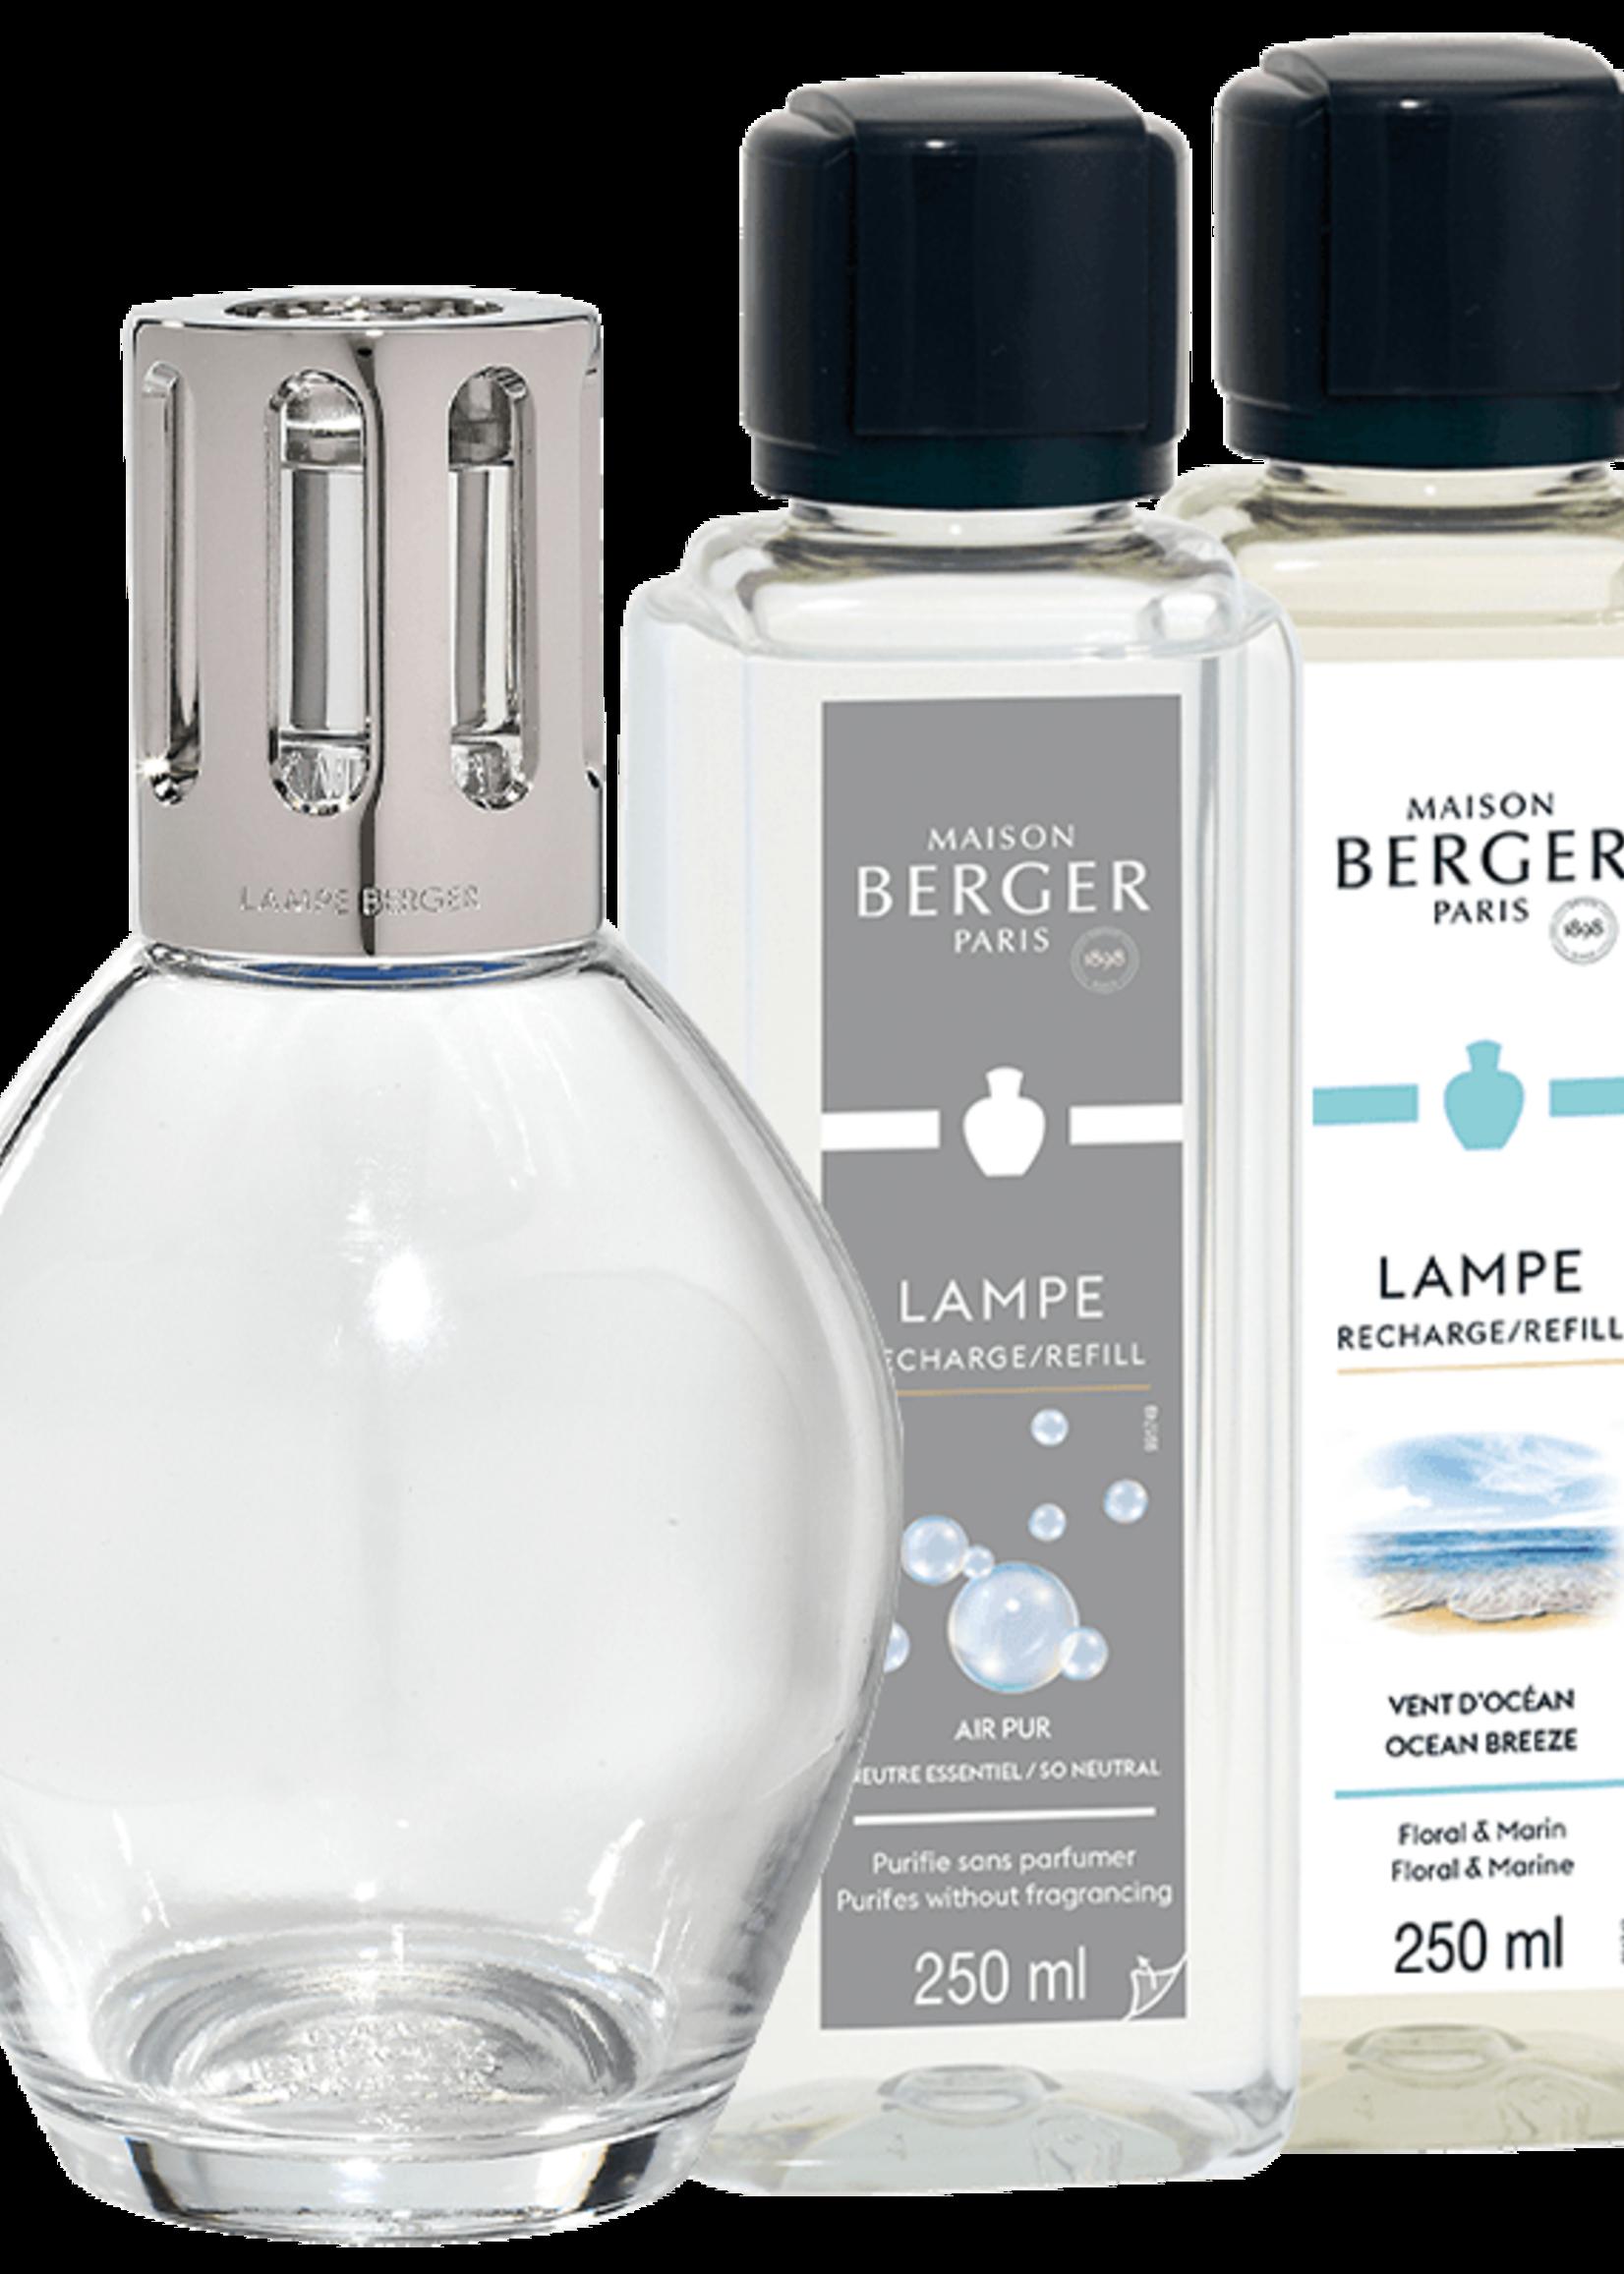 Parfum de Berger Lampe Berger Giftset Essentielle Ovale